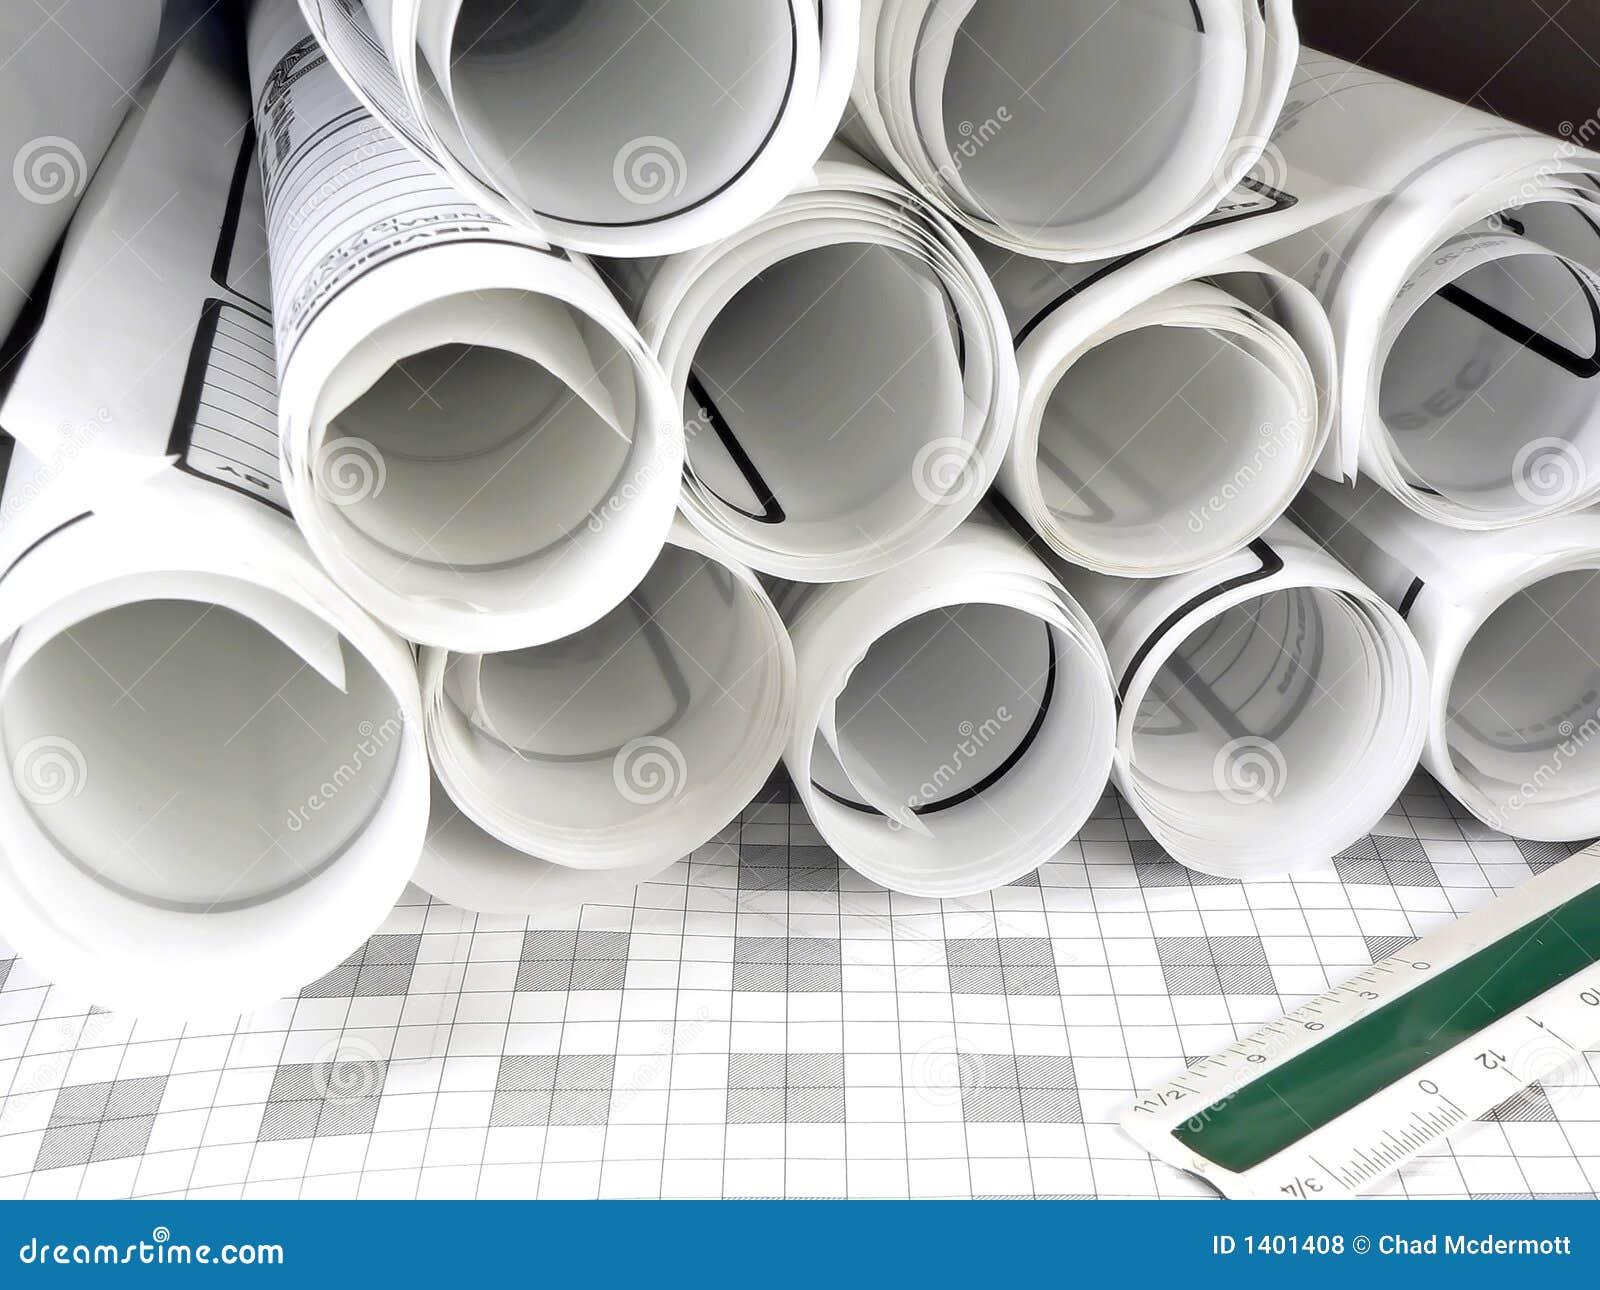 Architecture Blueprints architecture blueprints royalty free stock photos - image: 1401408